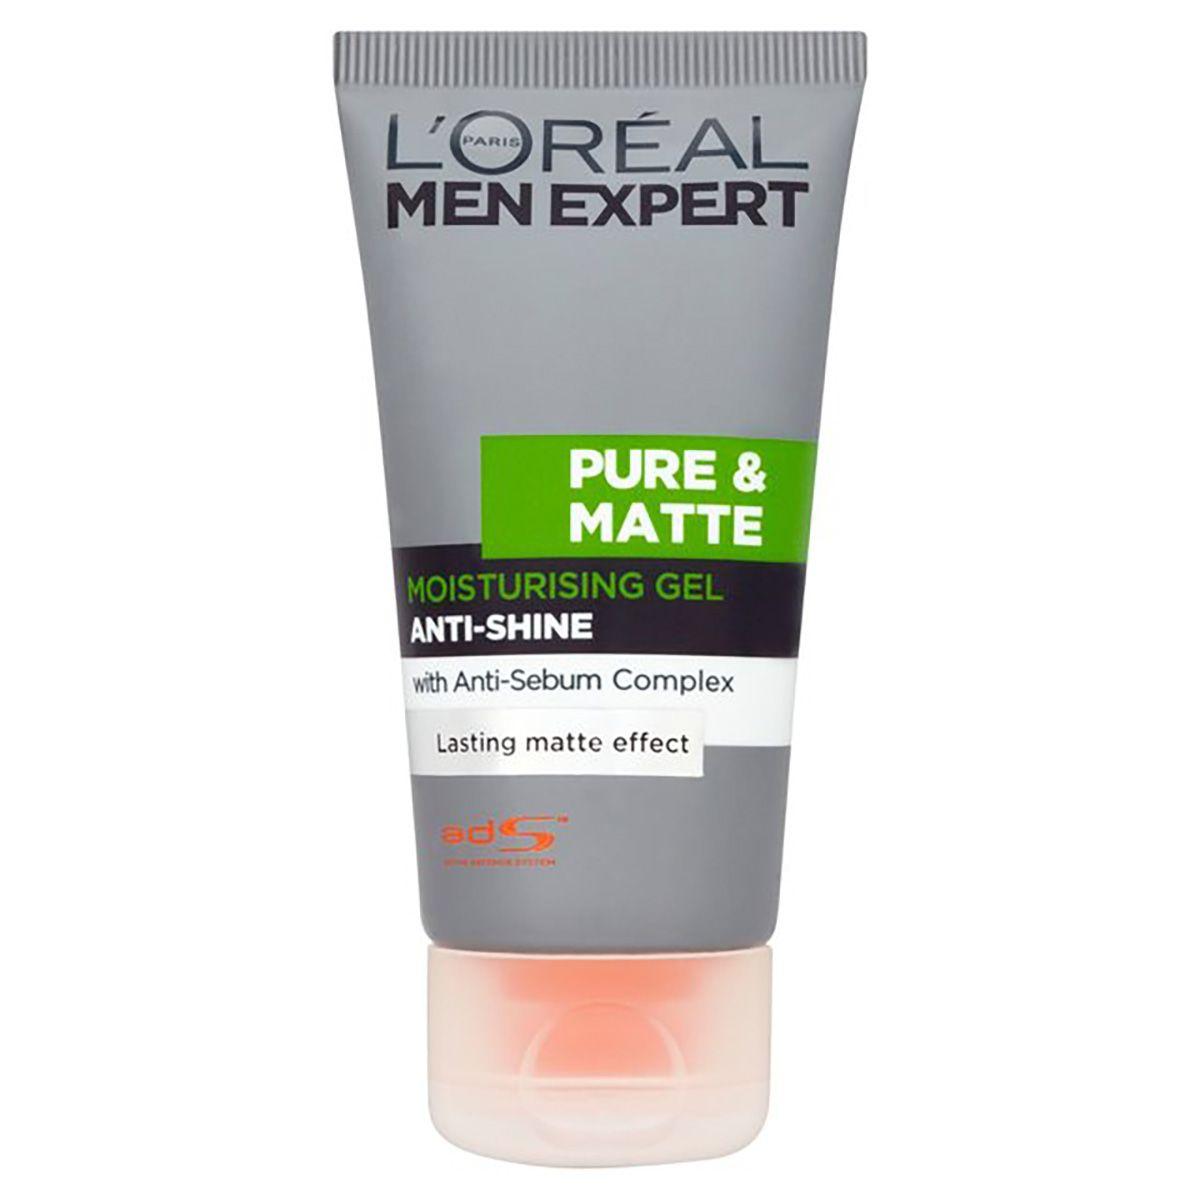 Loreal Paris Expert Pure And Matte Anti-shine Gel Moisturiser 50 ml